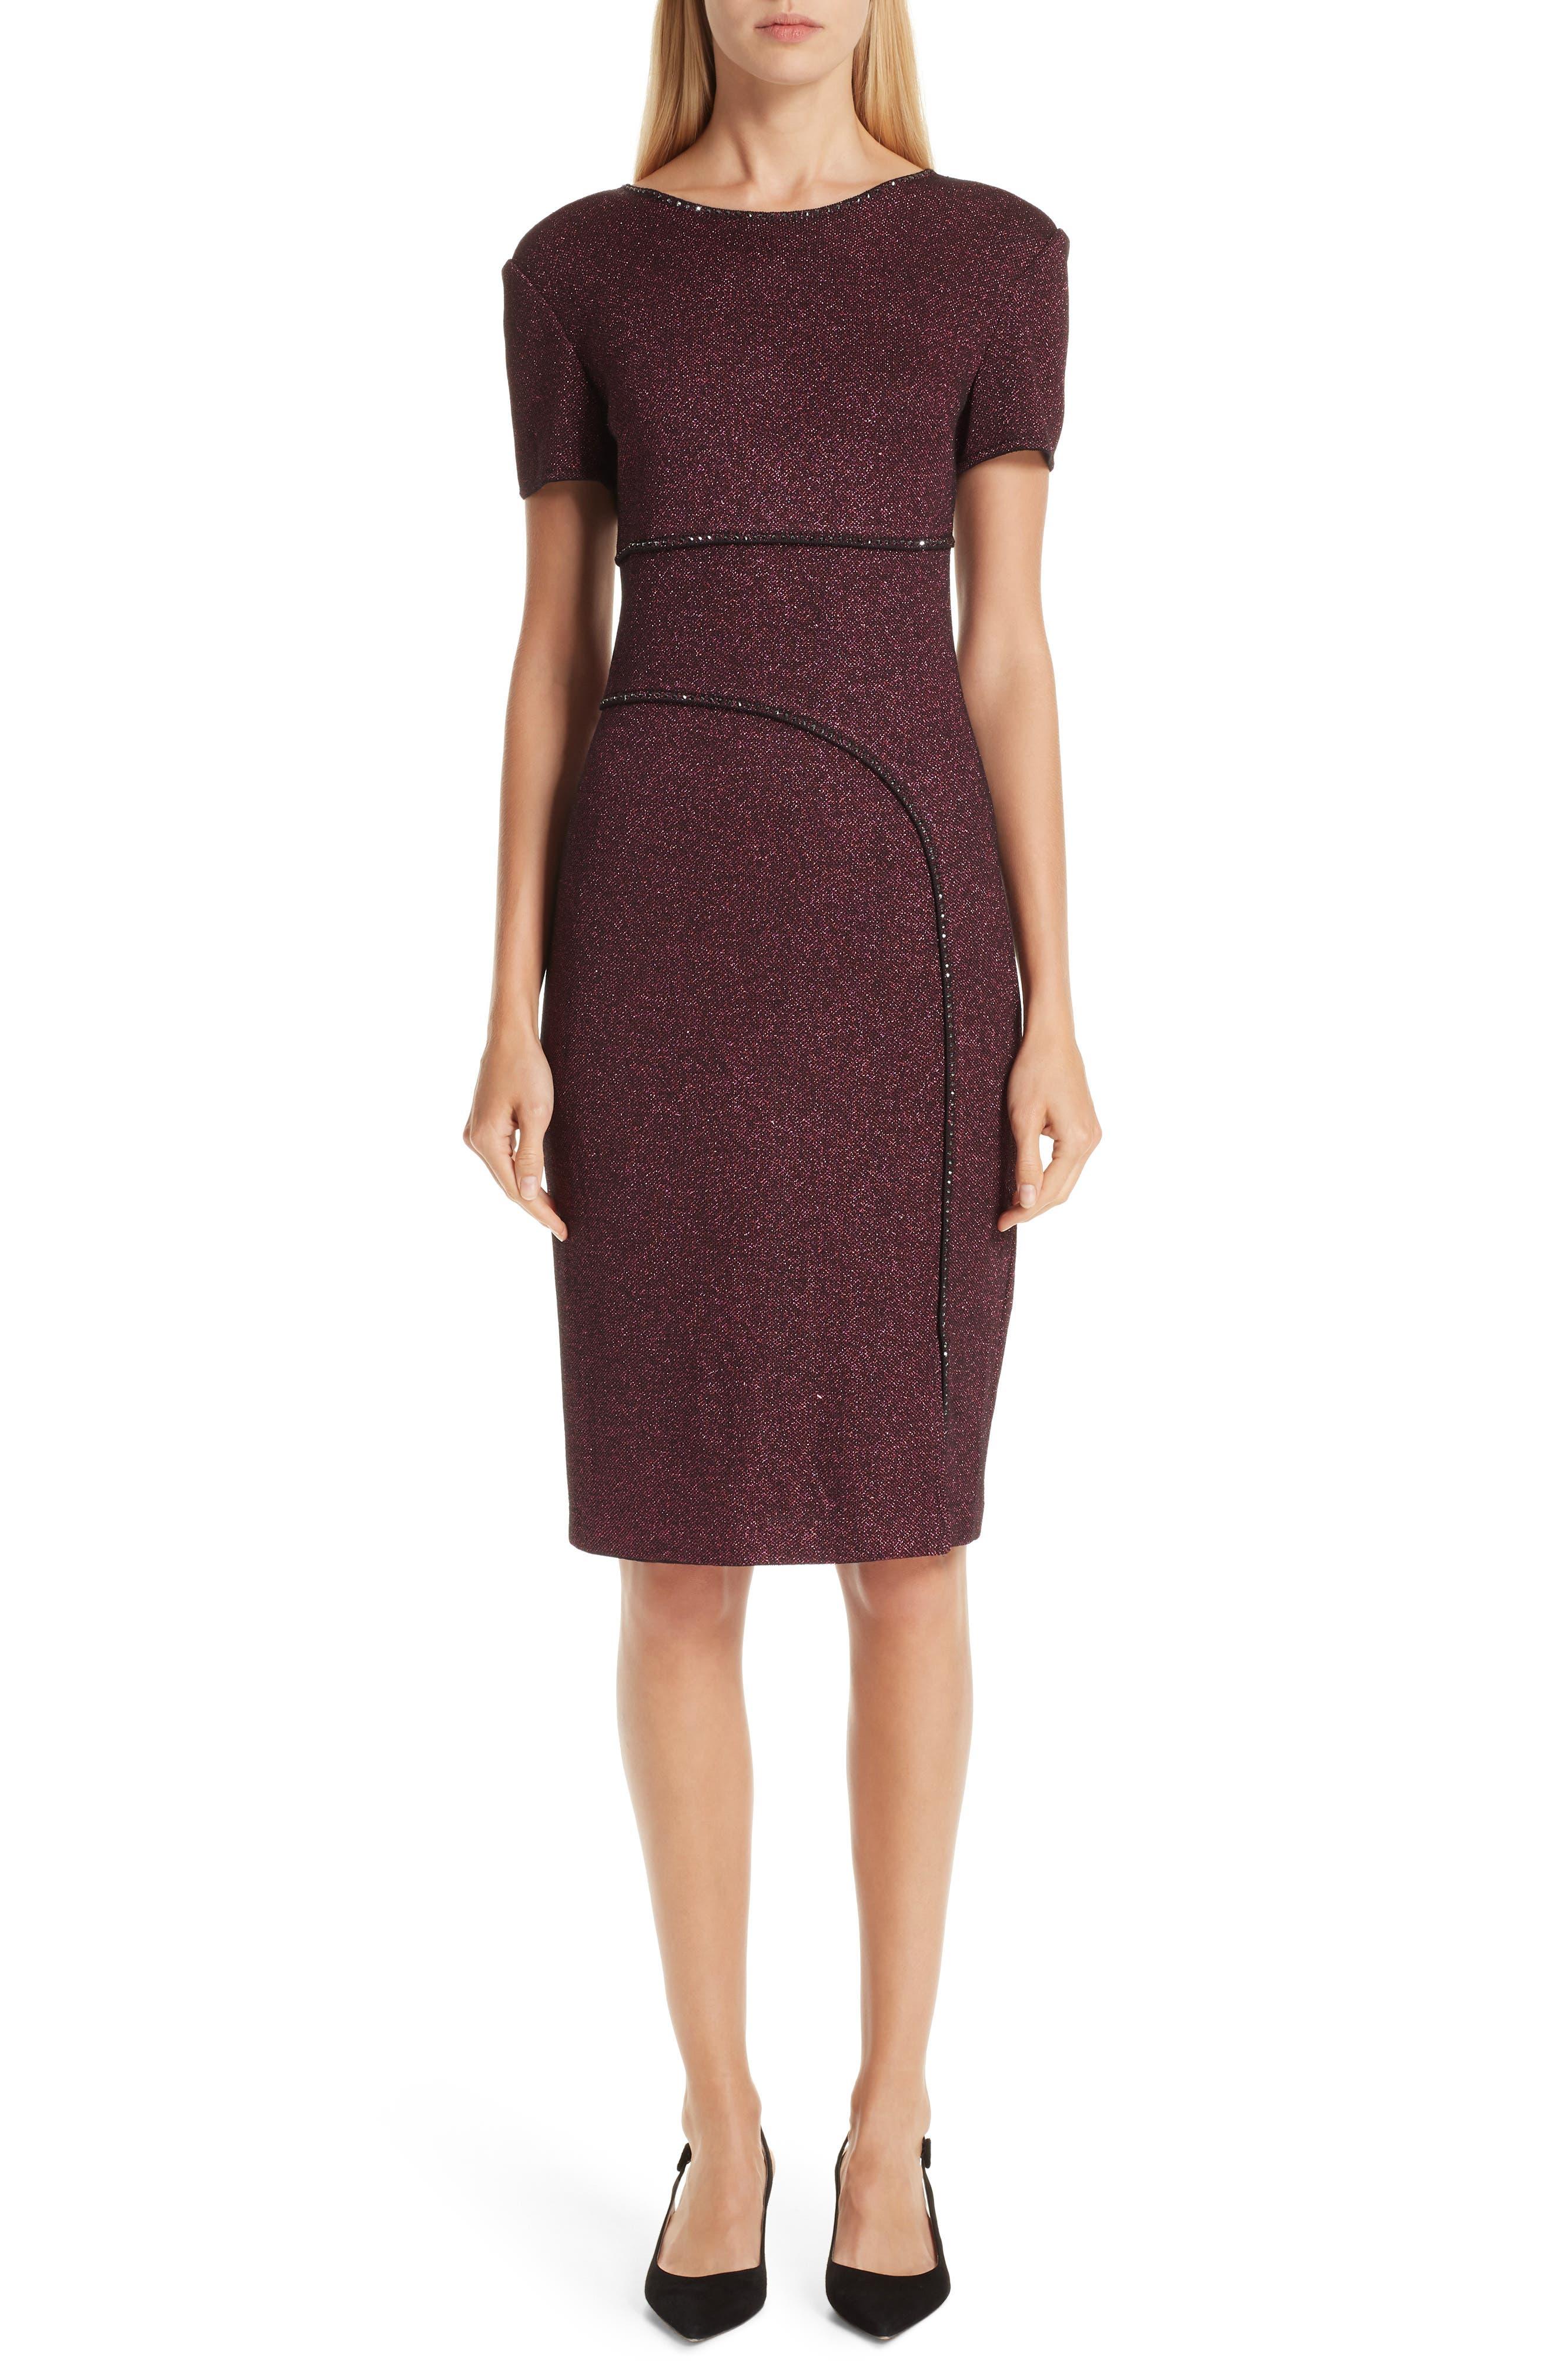 ST. JOHN COLLECTION, Mod Metallic Knit Sheath Dress, Main thumbnail 1, color, DARK PINK MULTI